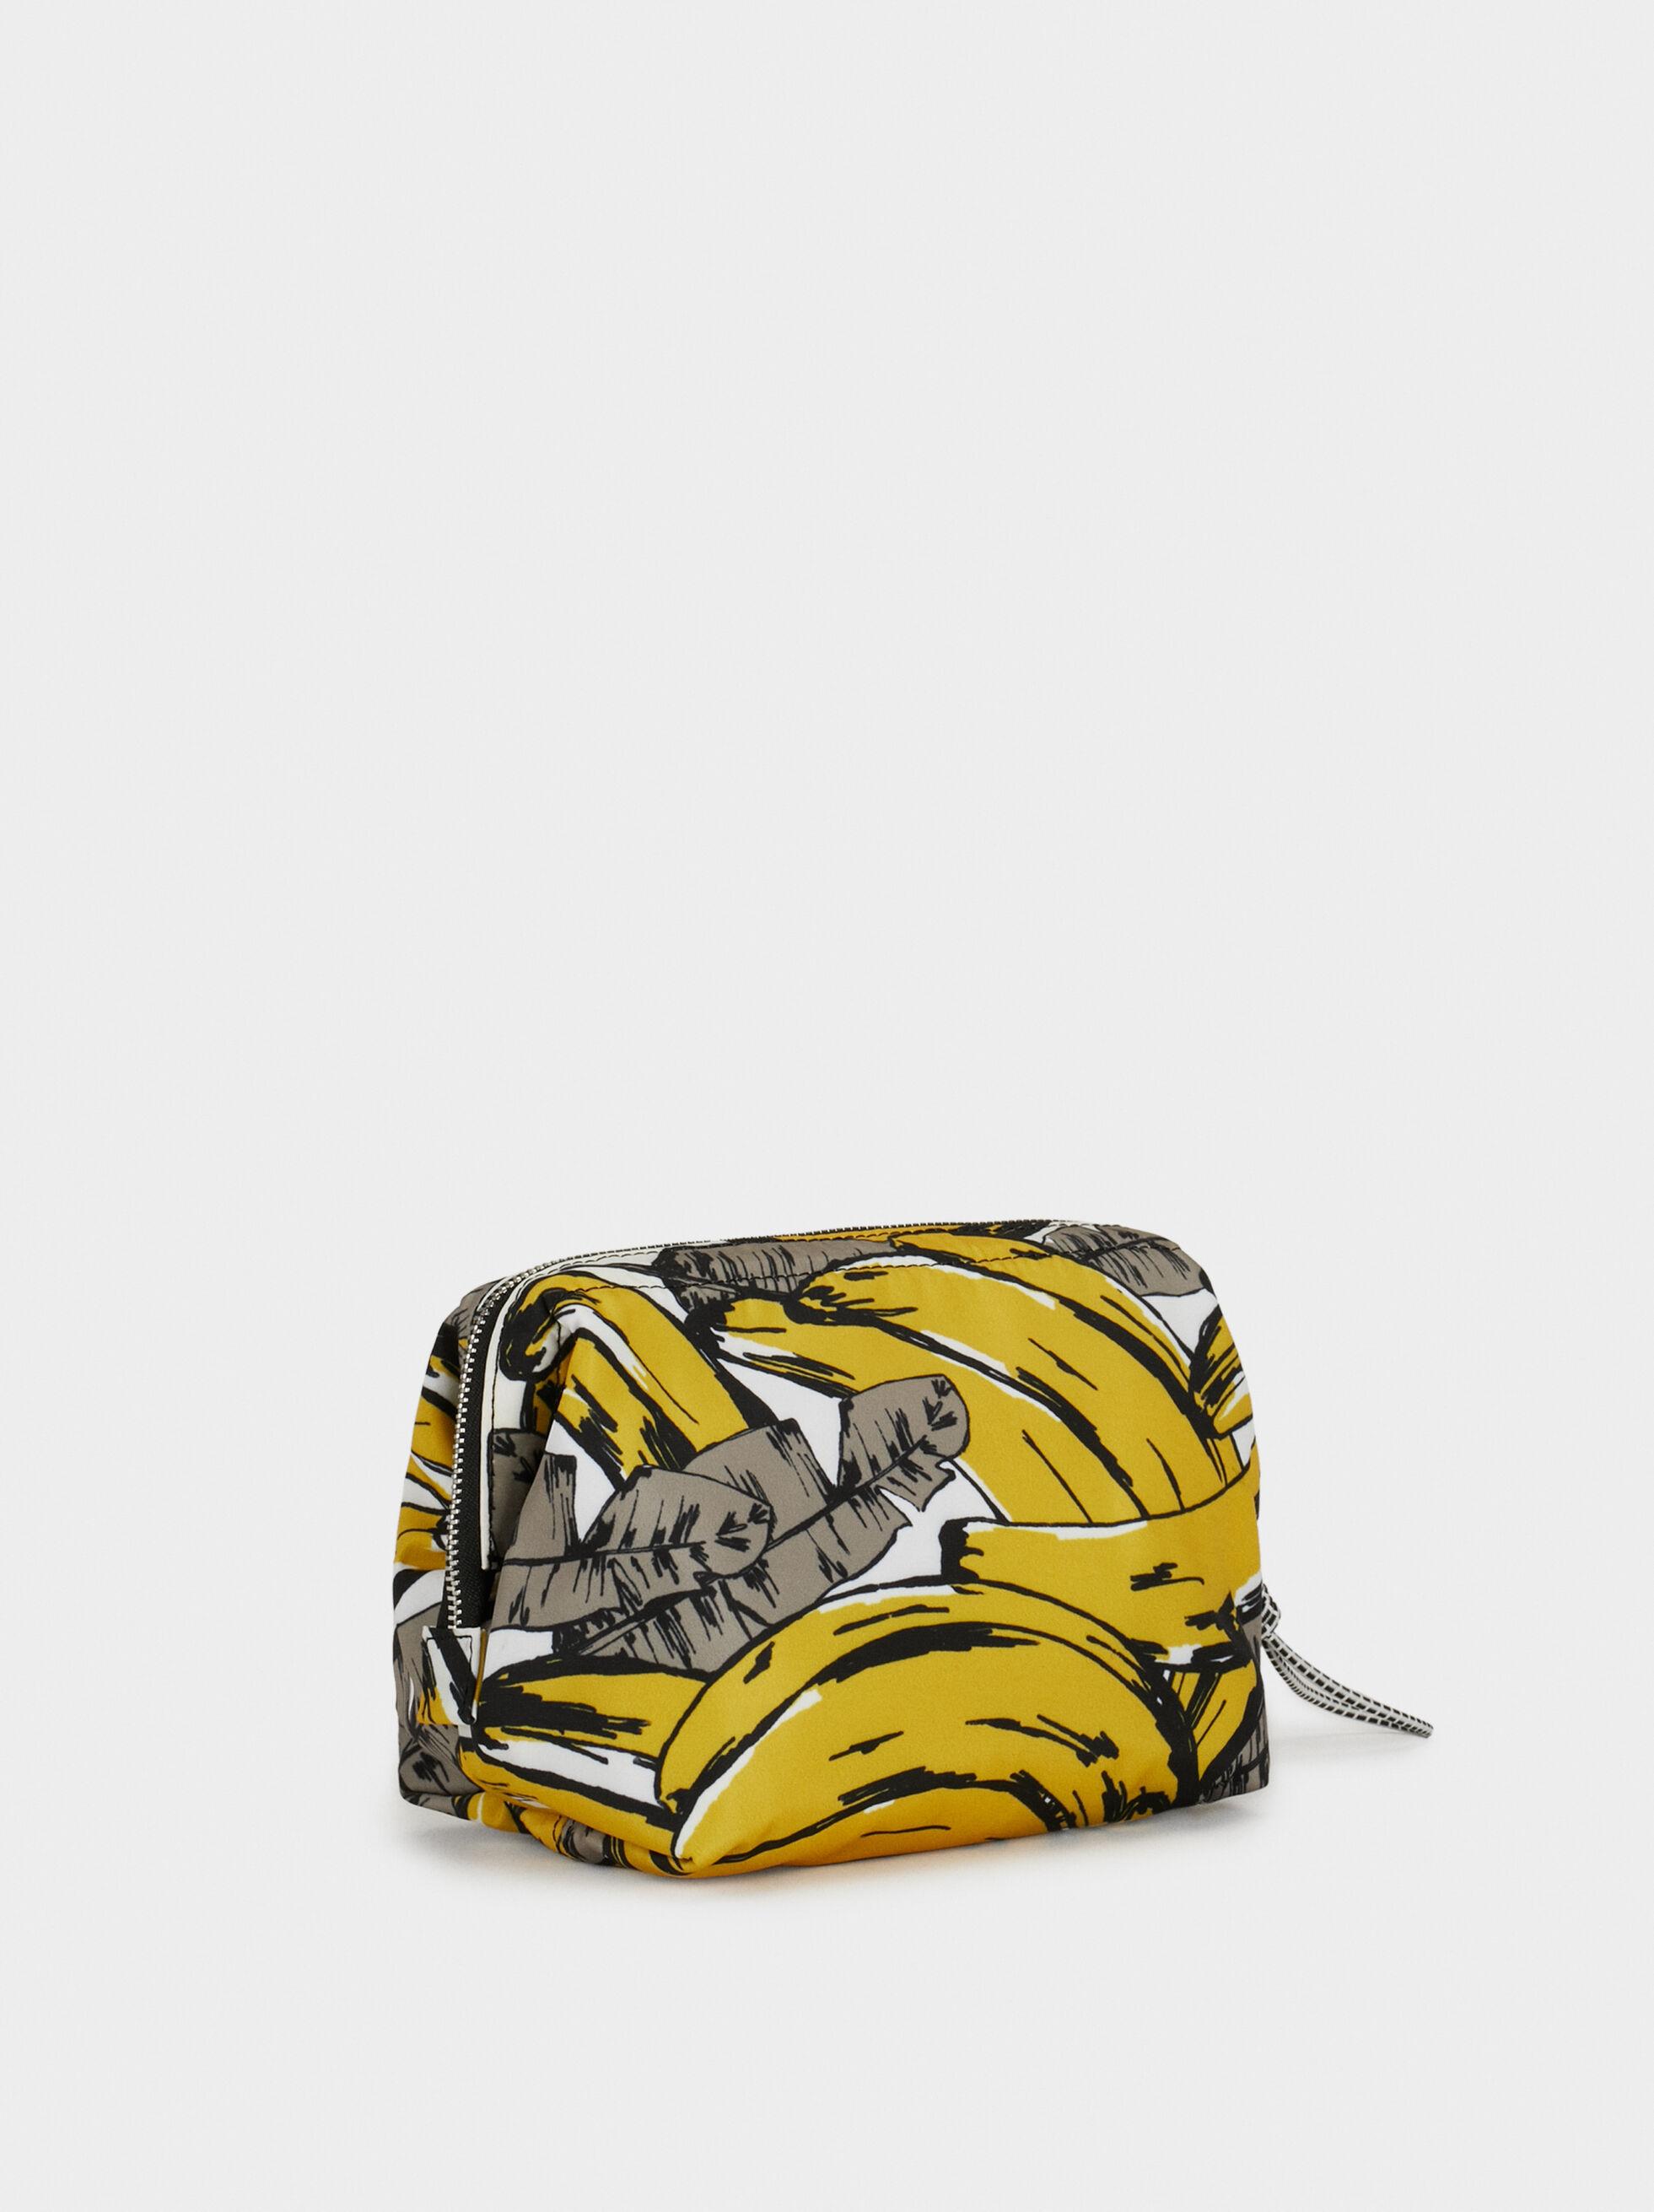 Medium Nylon Toiletry Bag, Yellow, hi-res